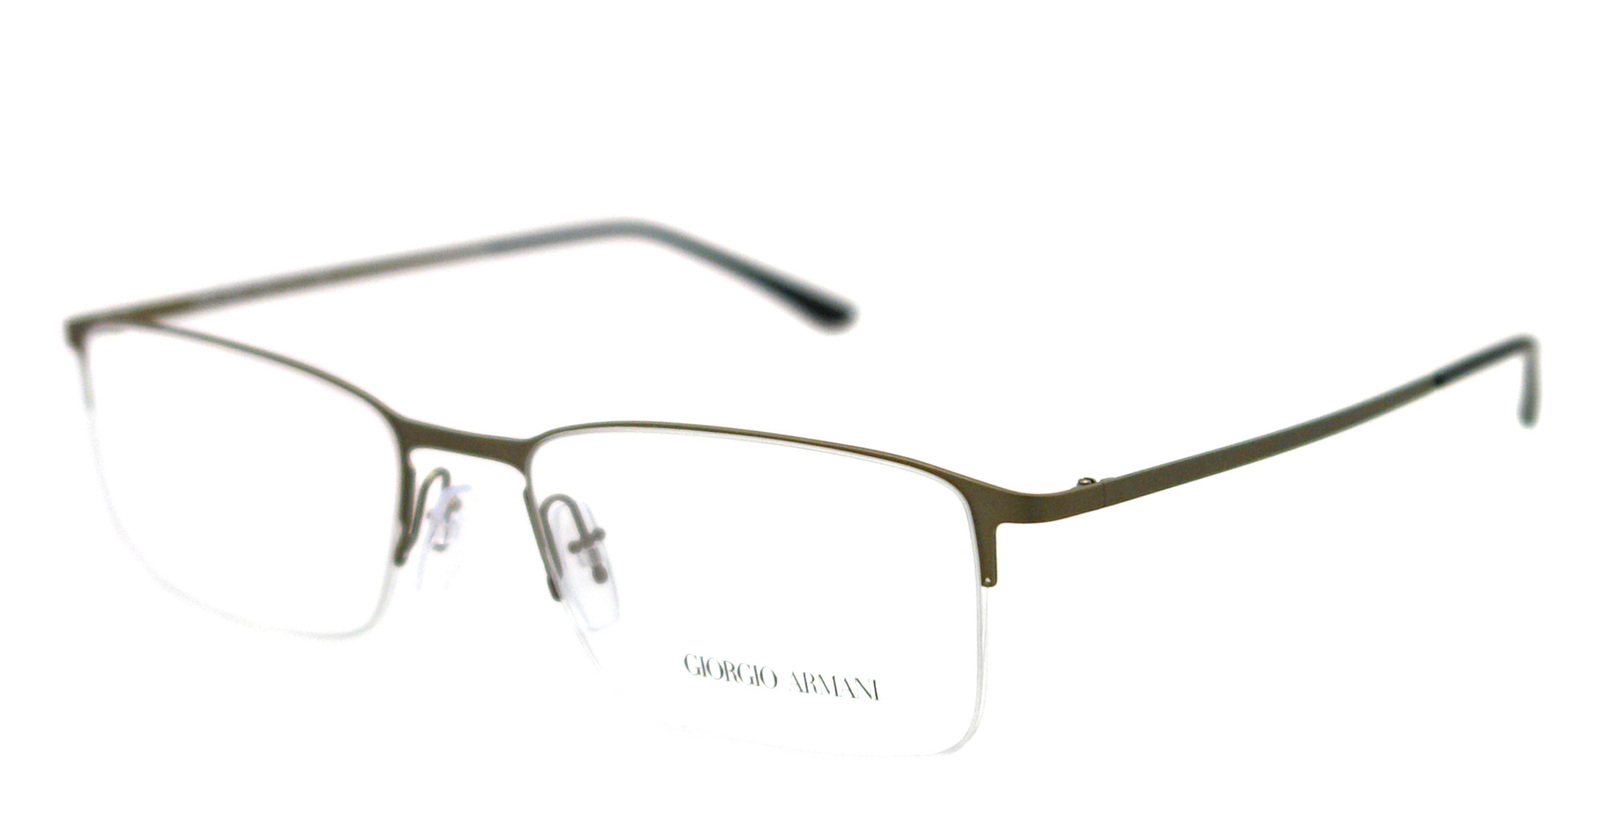 9ec0df645b7a Giorgio Armani Rimless Glasses